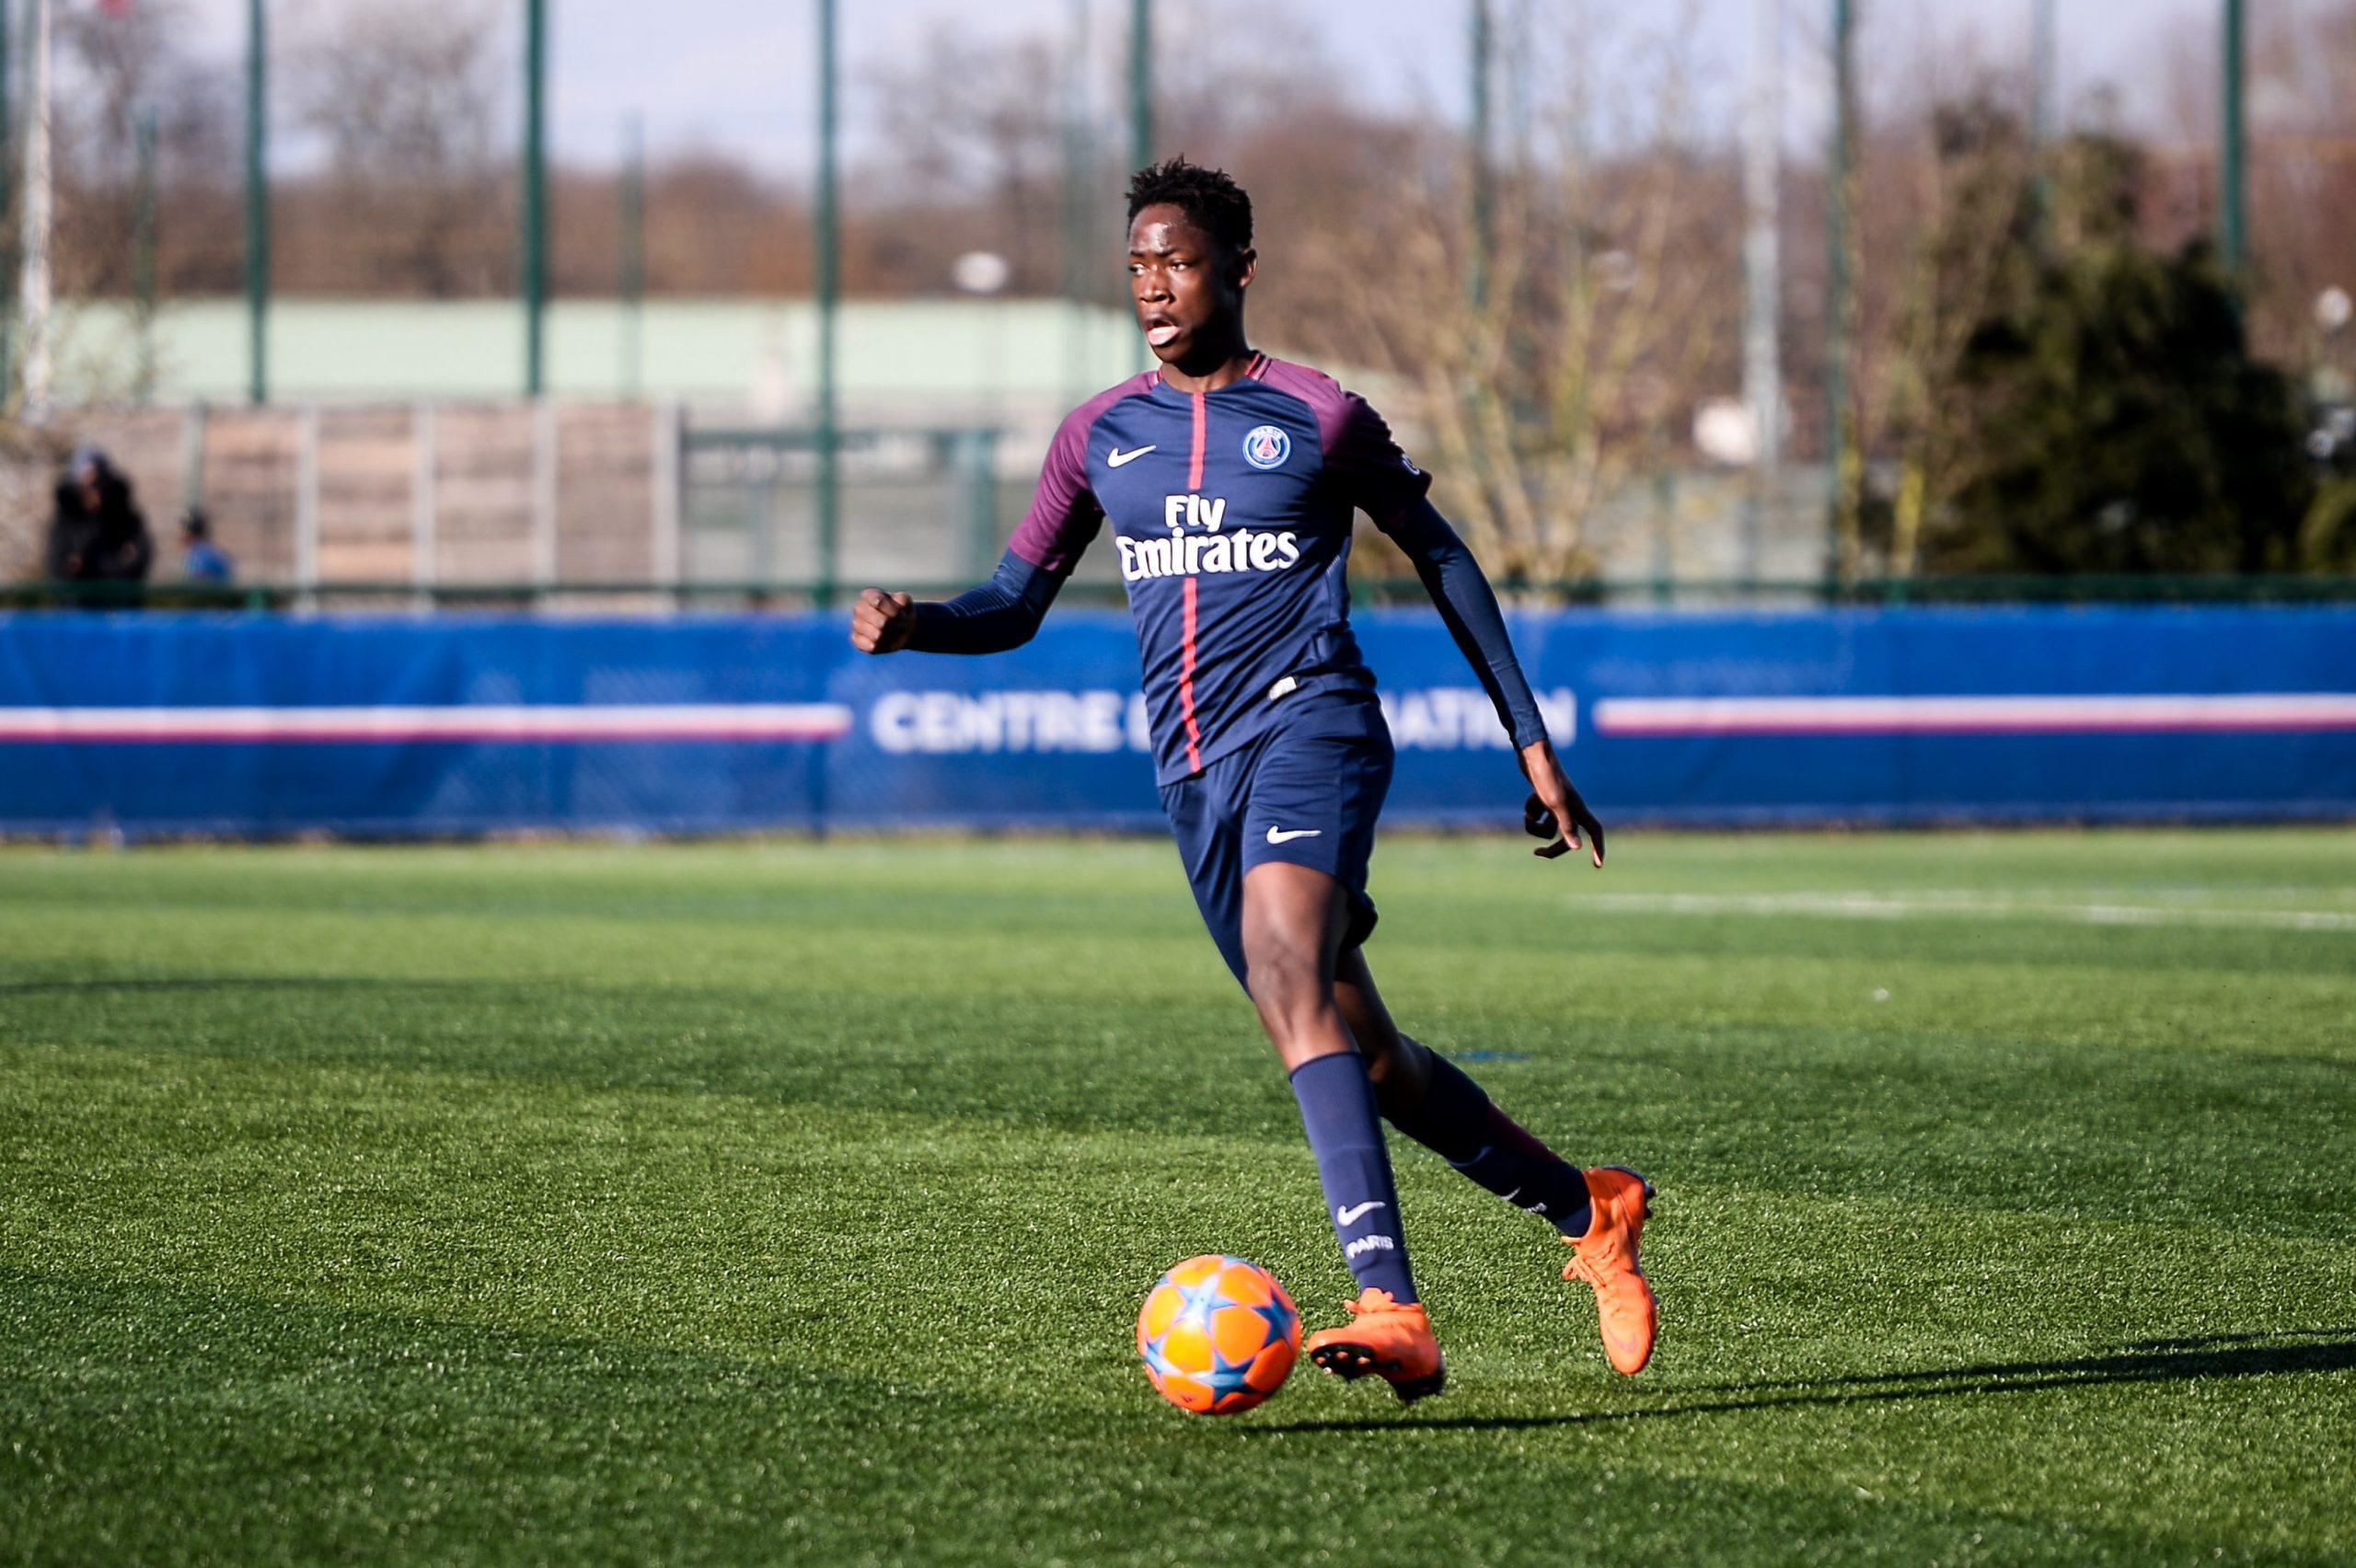 Le PSG compte bien garder son Titi El Chadaille Bitshiabu, indique France Football